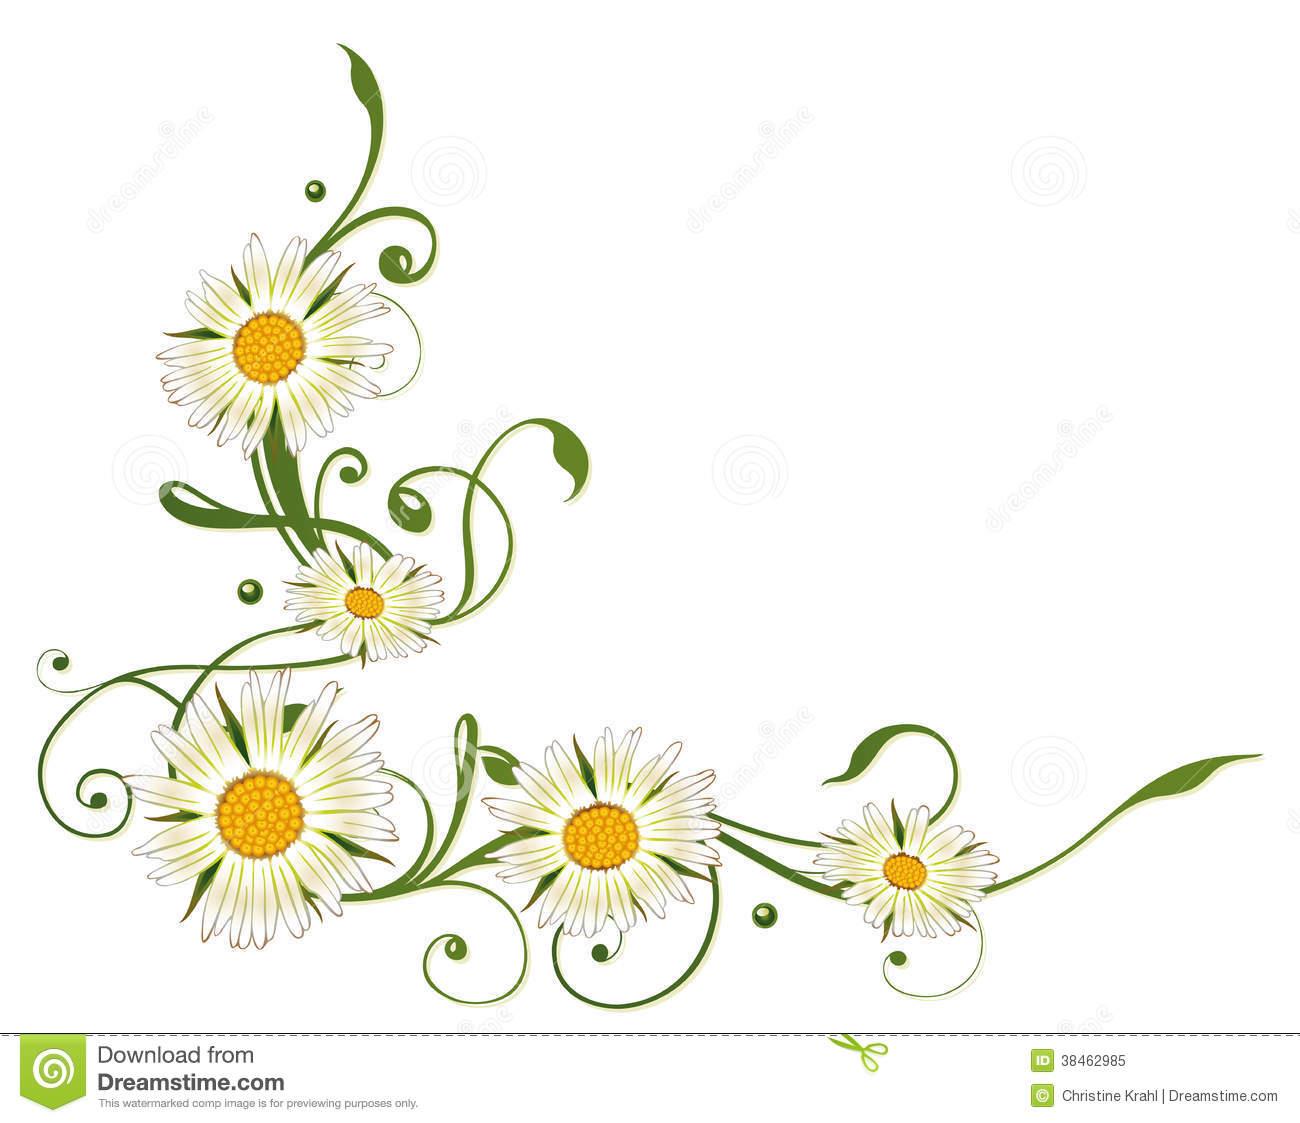 Clipart daisies free.